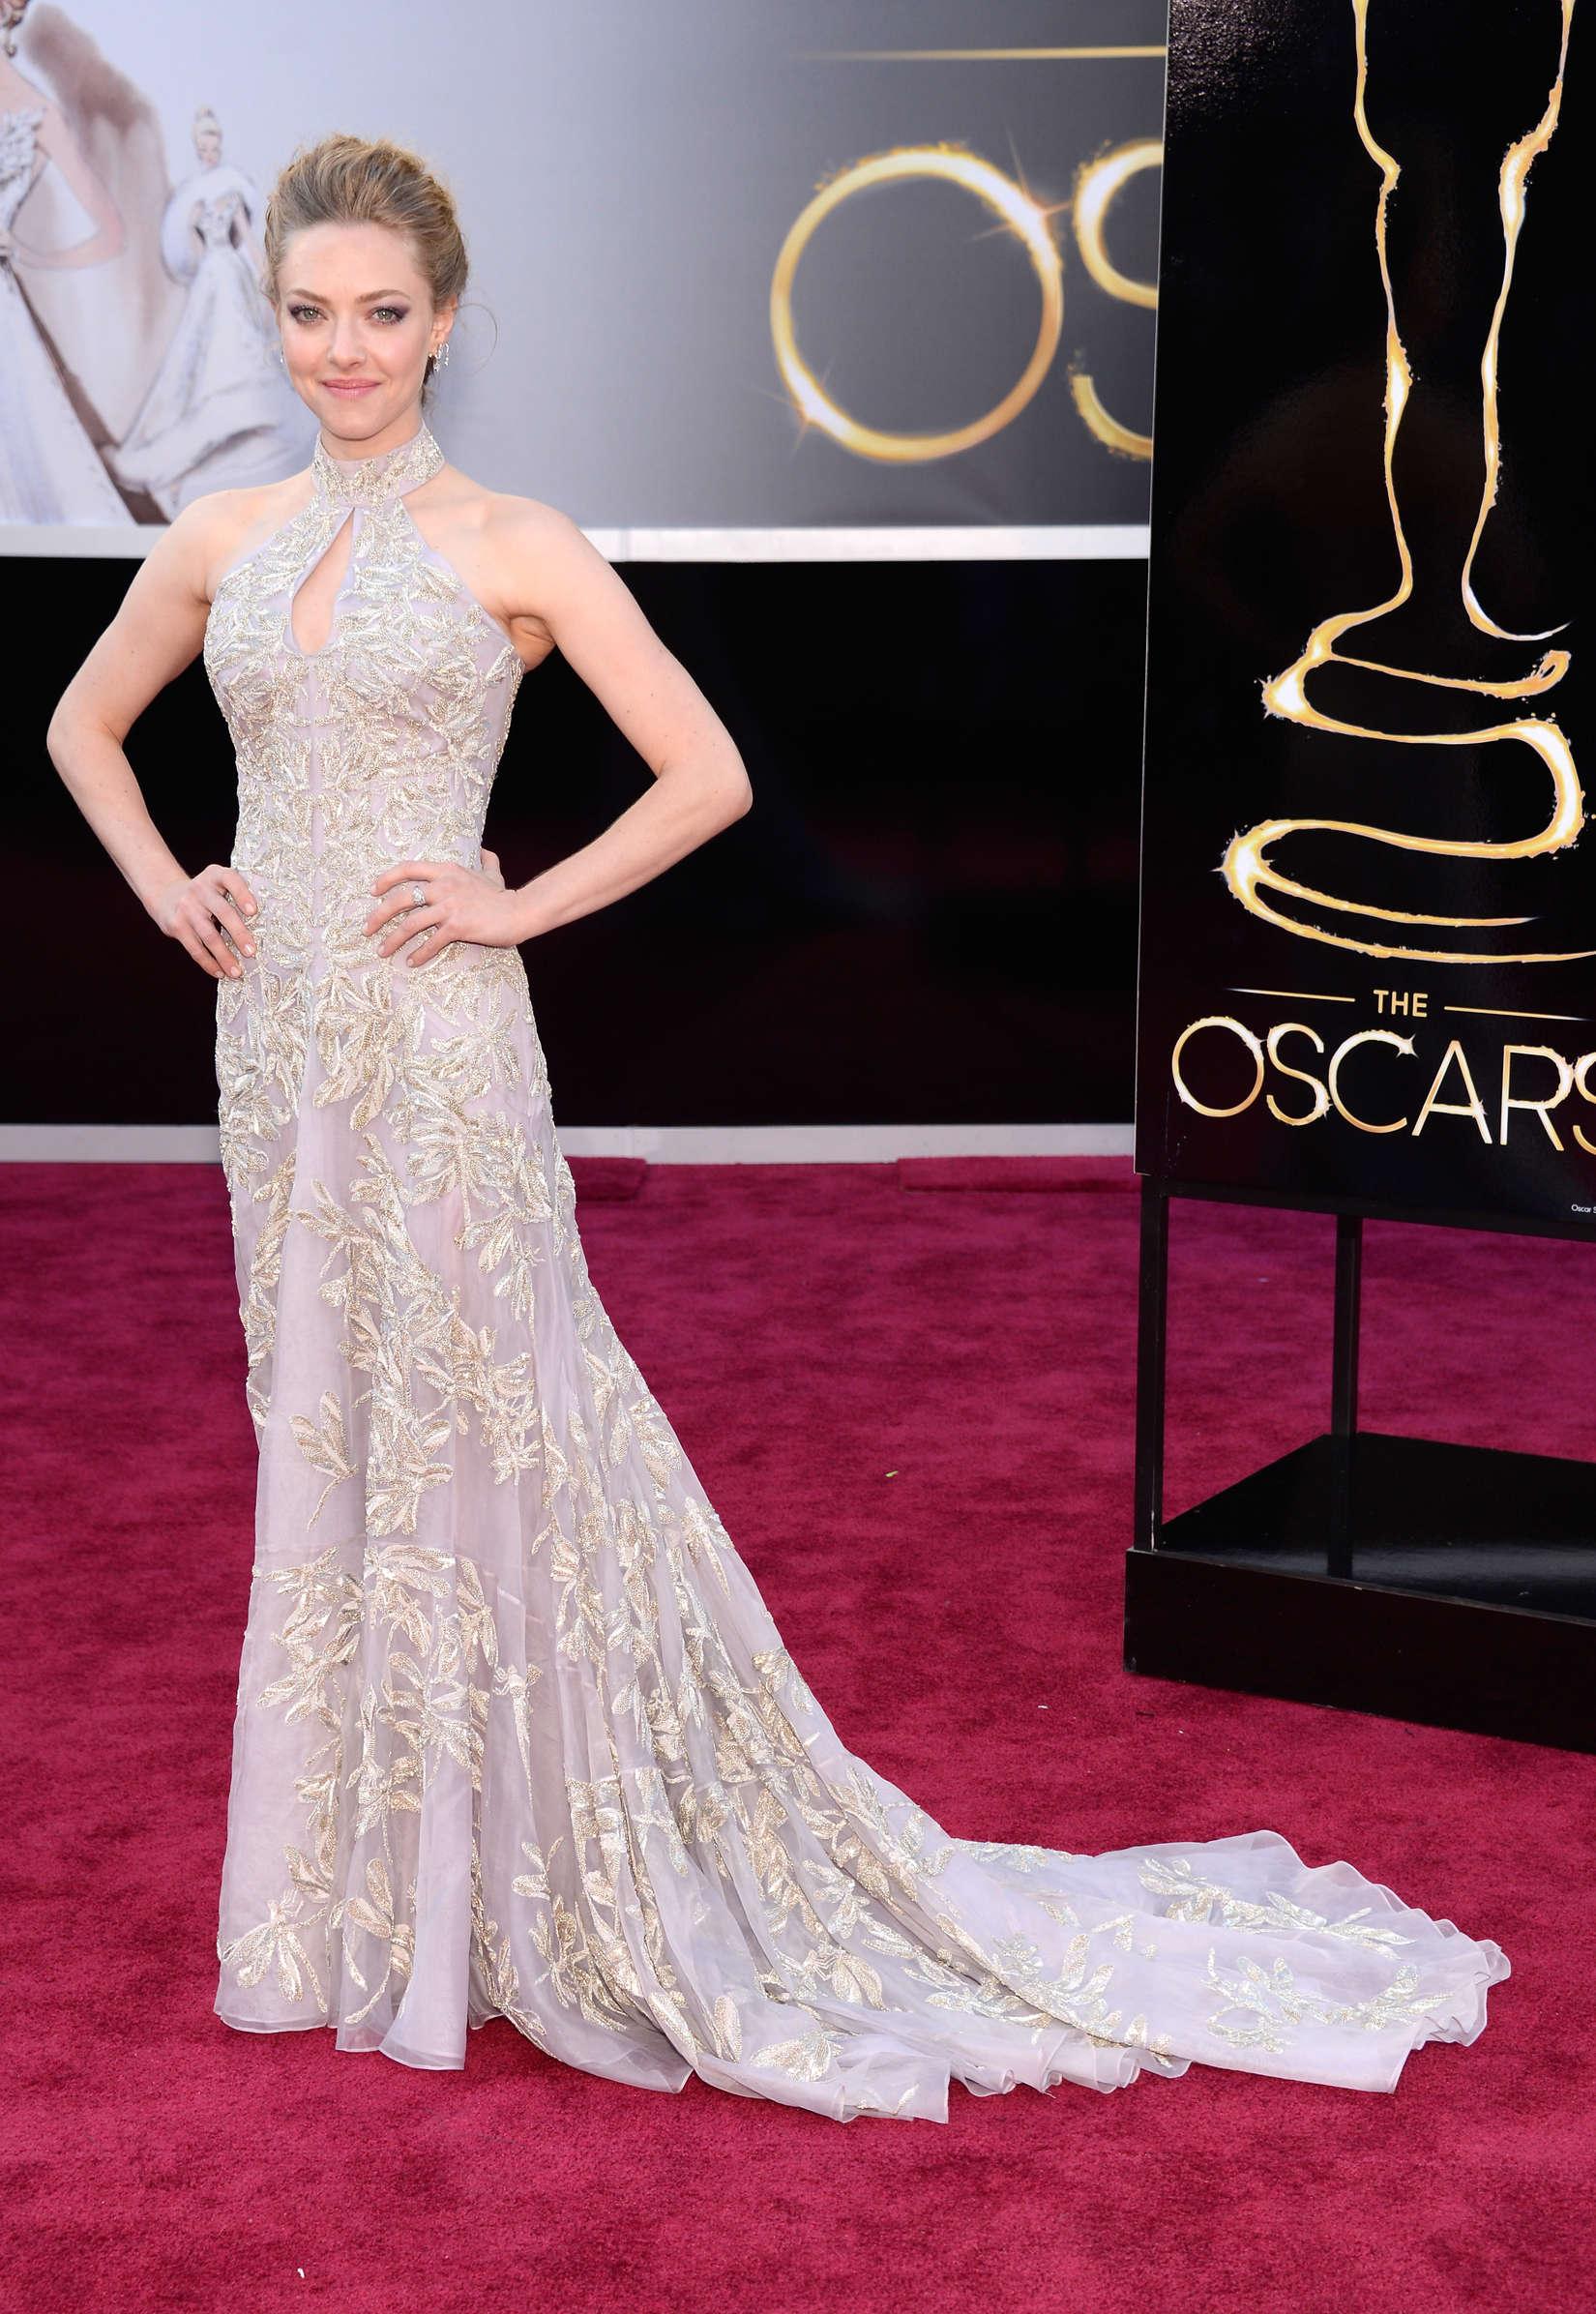 Amanda Seyfried - Oscars 2013 -02 - GotCeleb